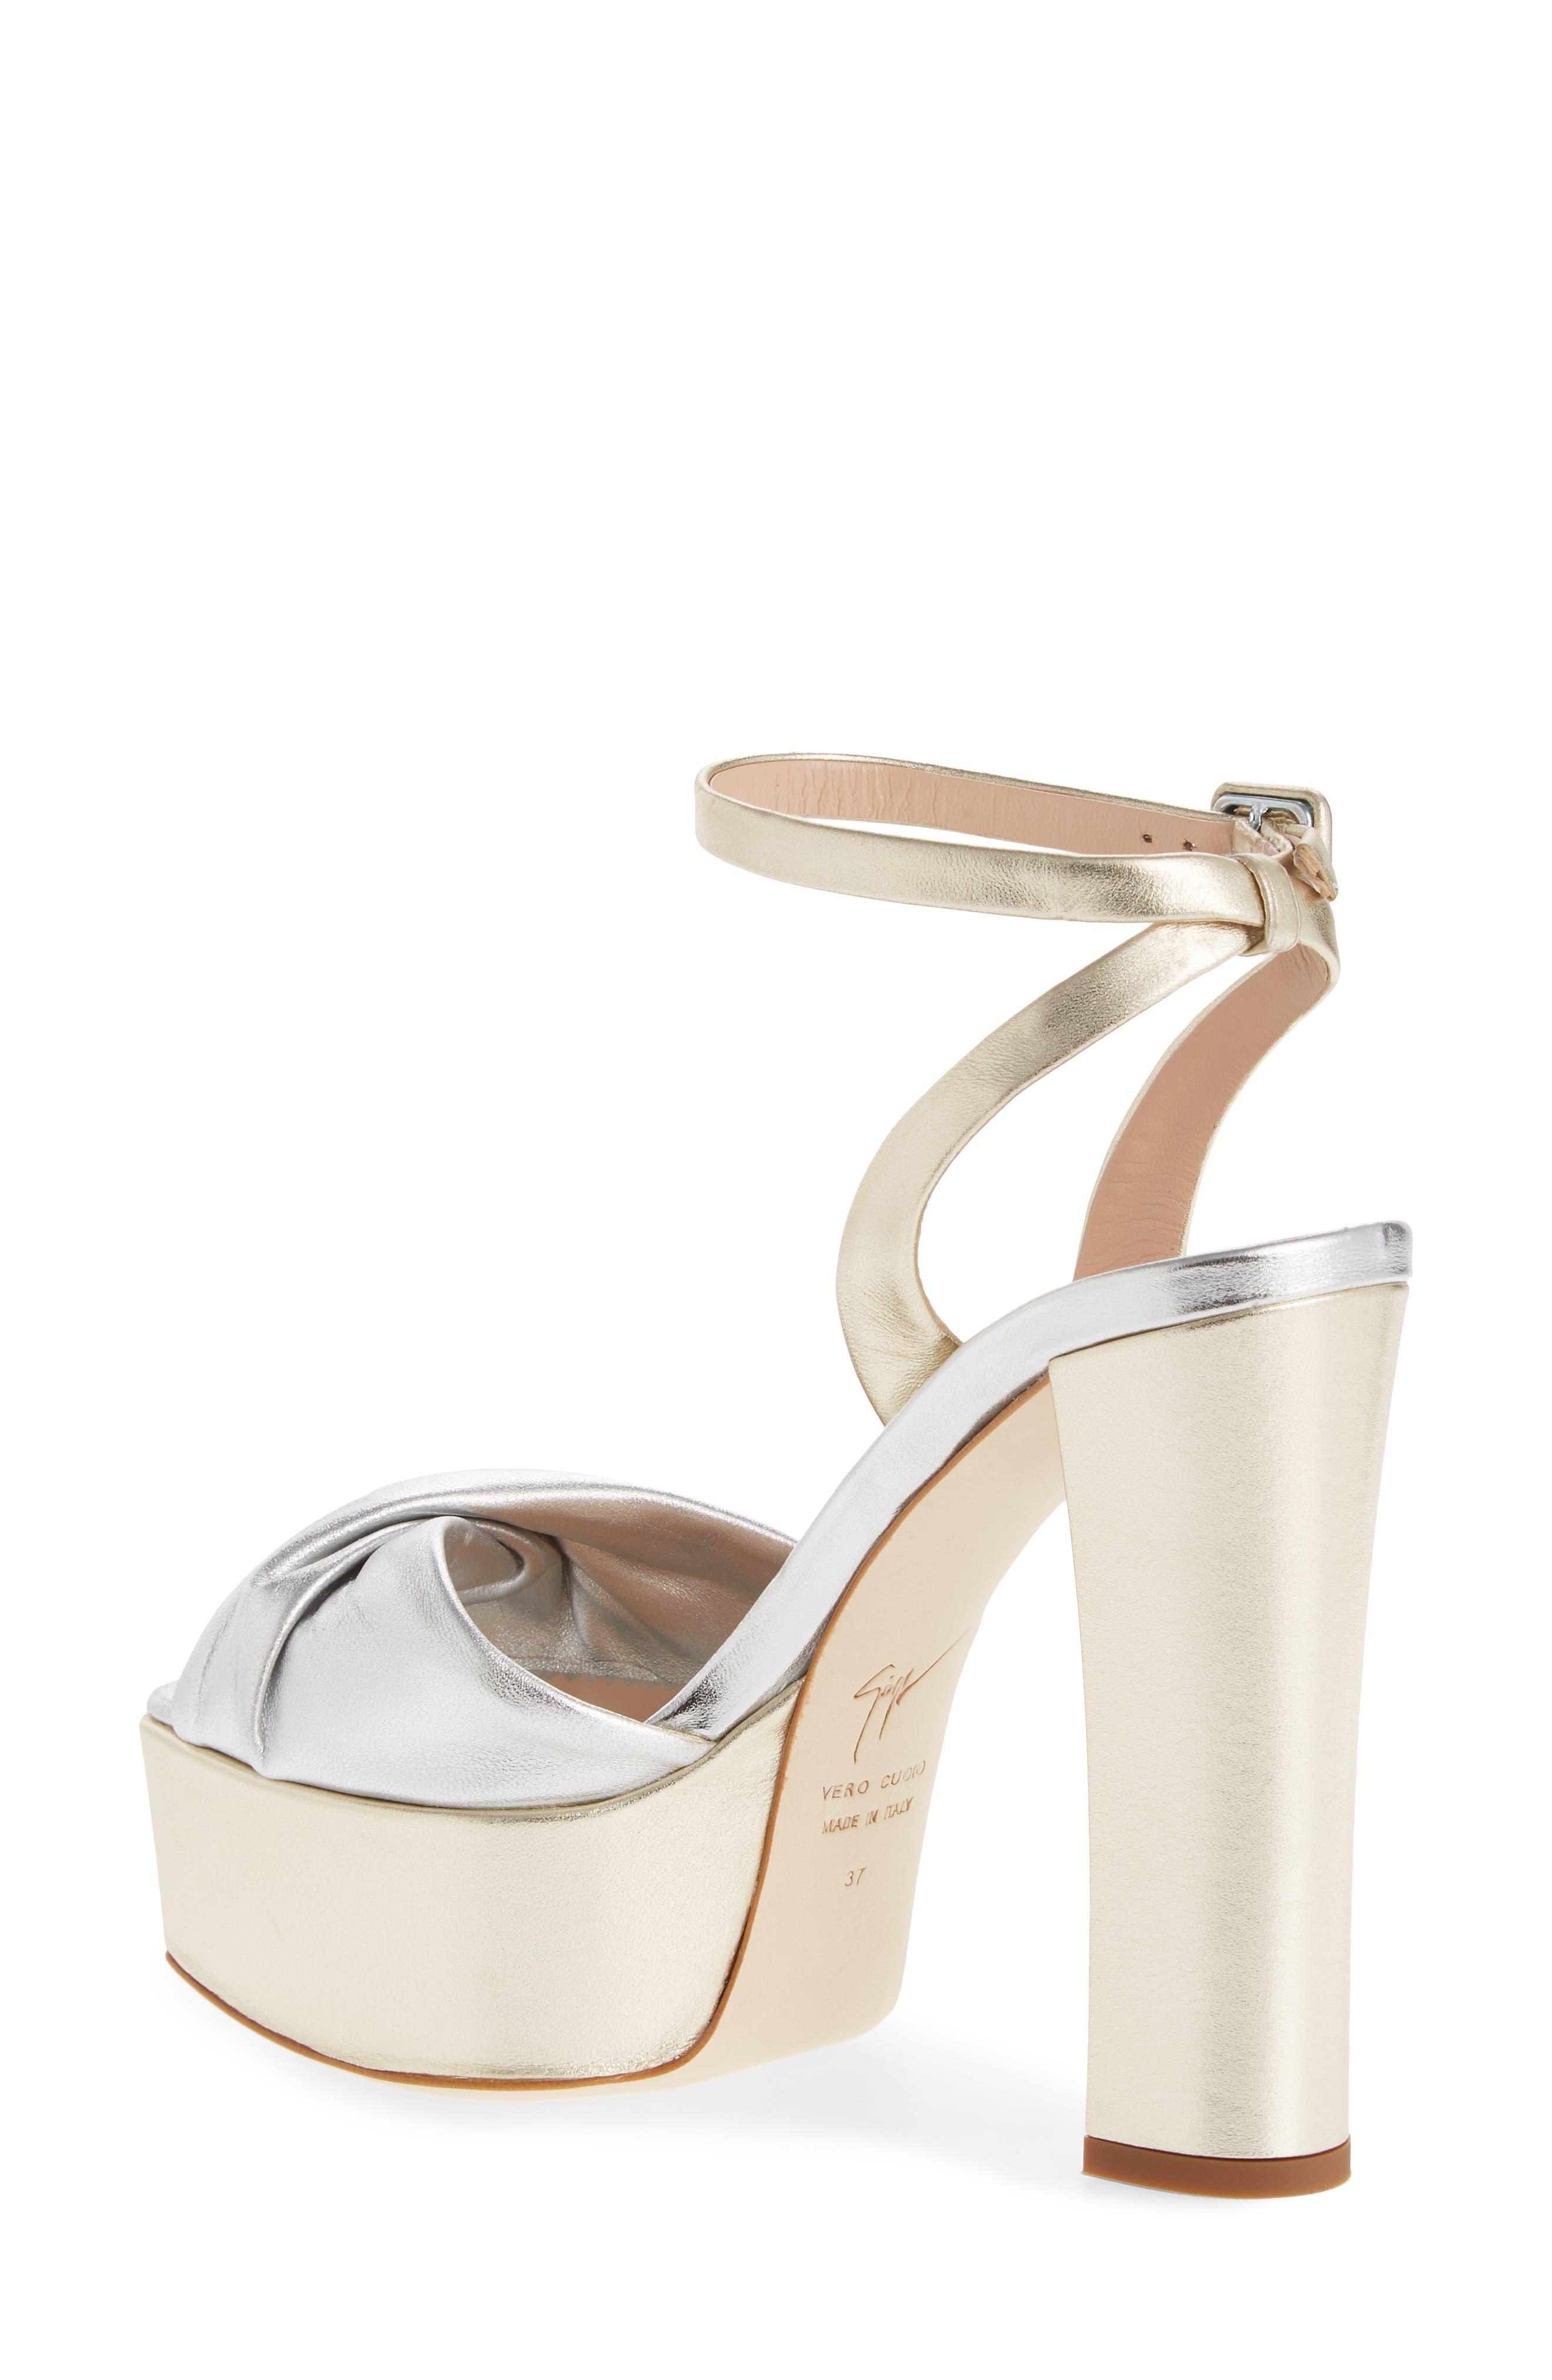 Ankle Strap Platform Sandal,                             Alternate thumbnail 2, color,                             040